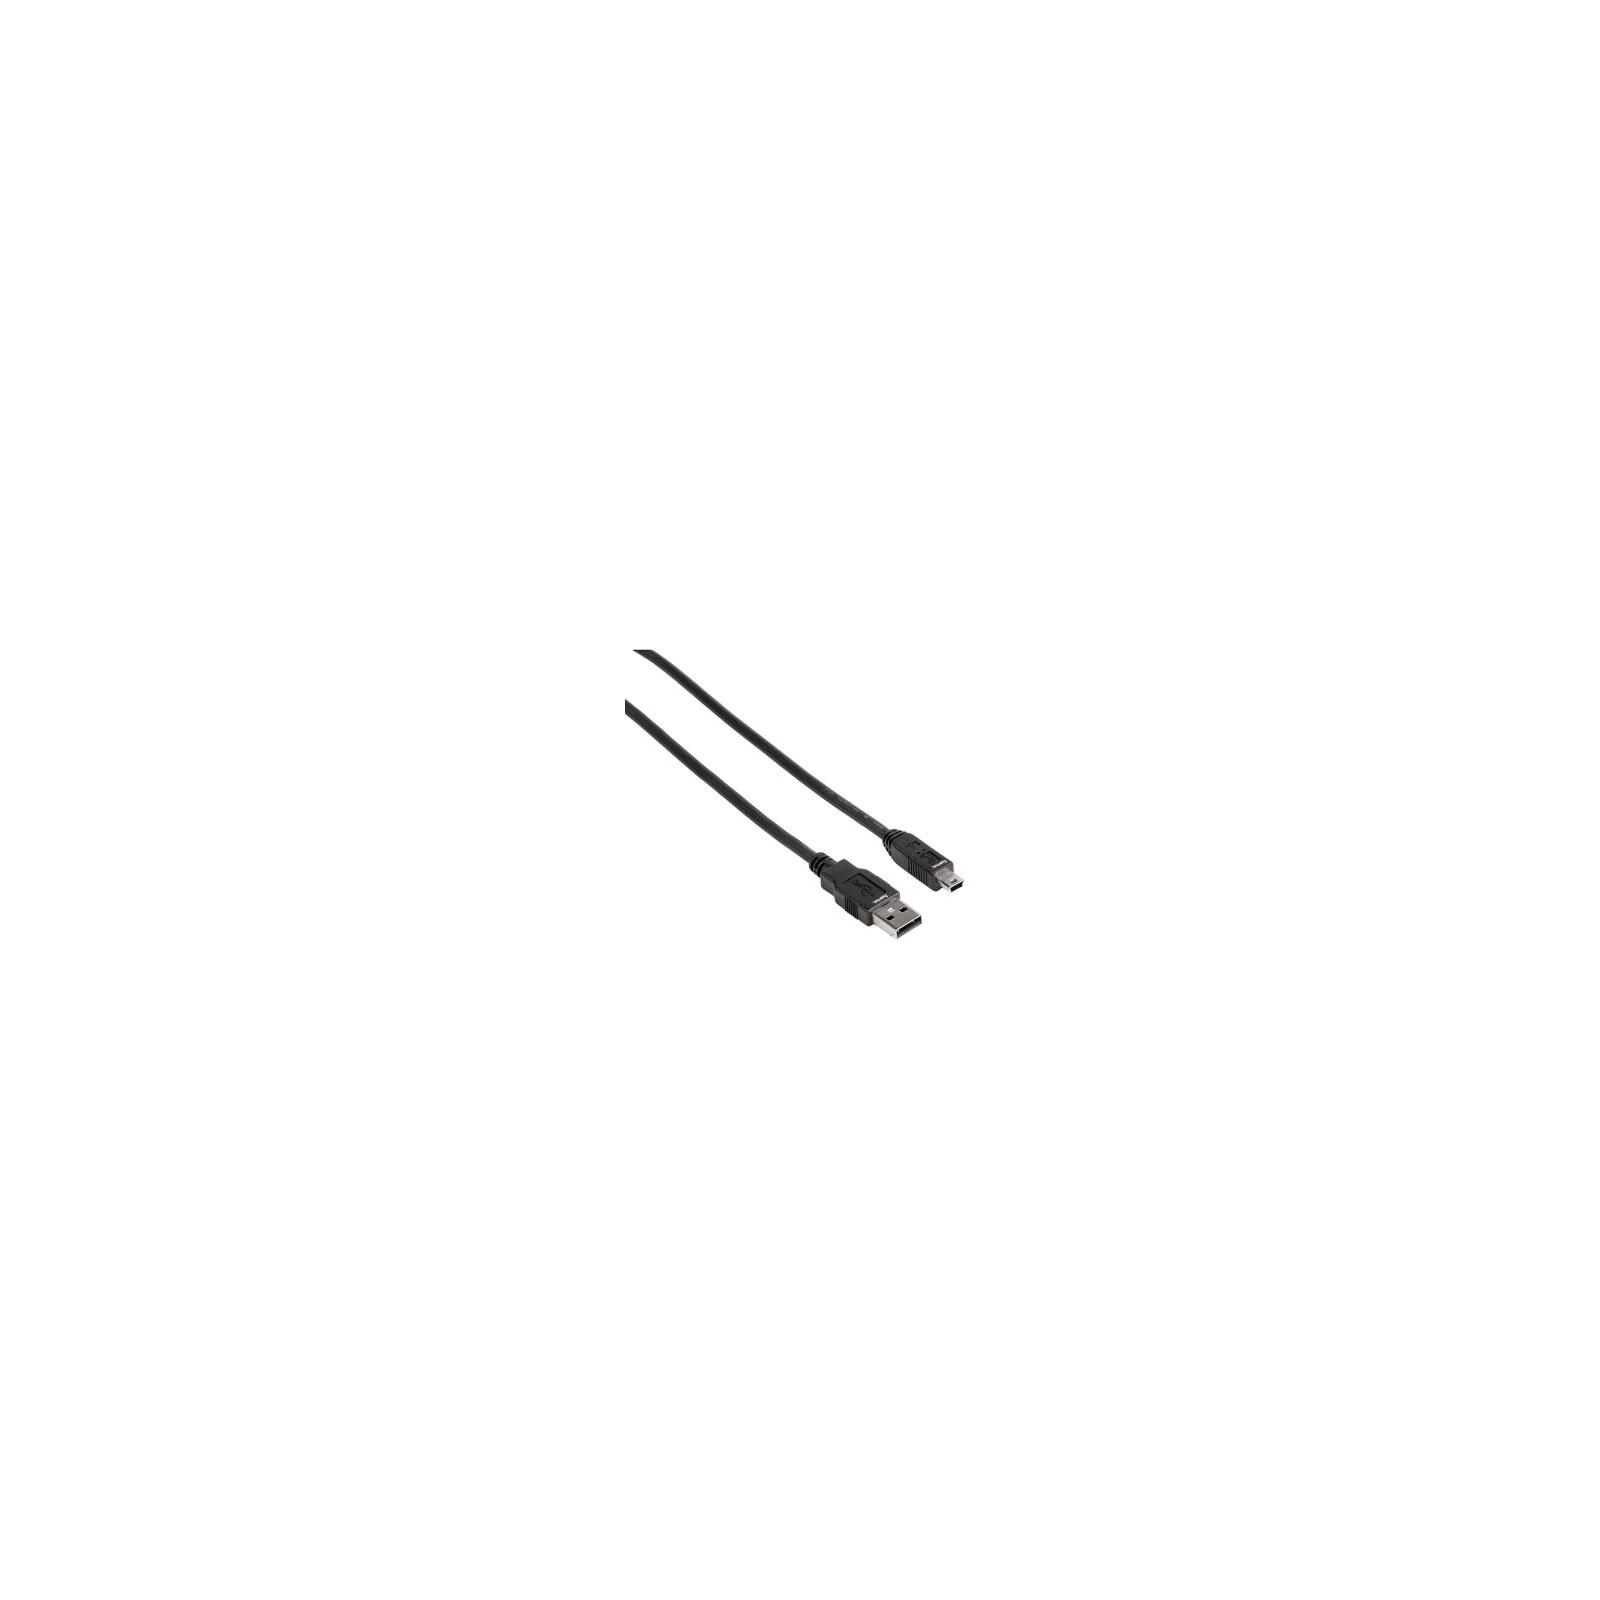 Hama 88480 USB 2.0 A/B 1,80m Kabel